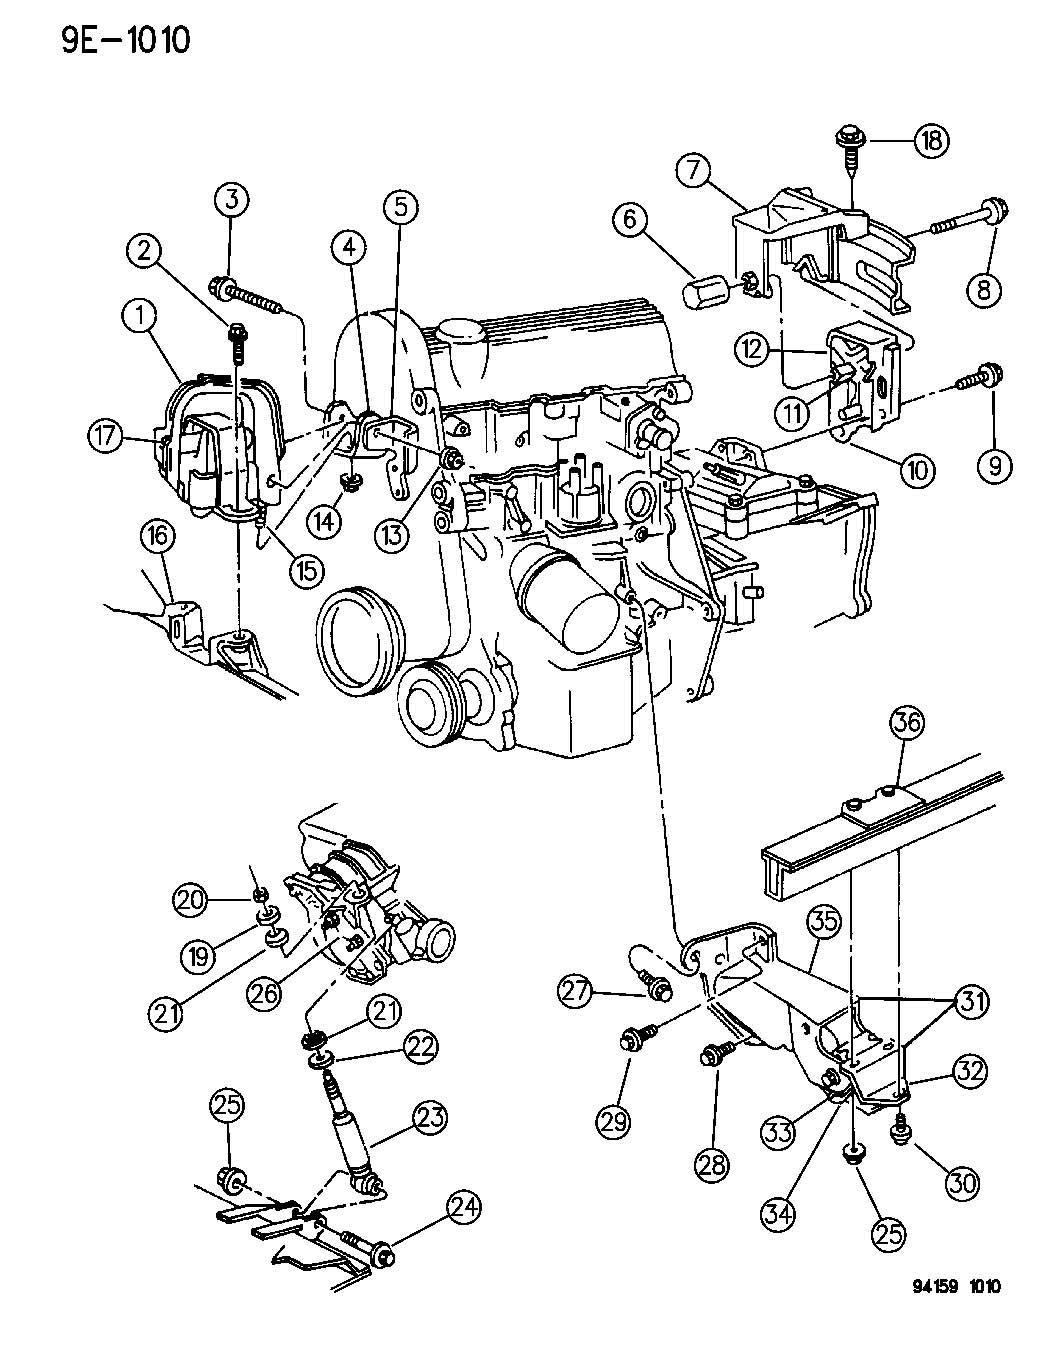 1994 plymouth sundance wiring diagram